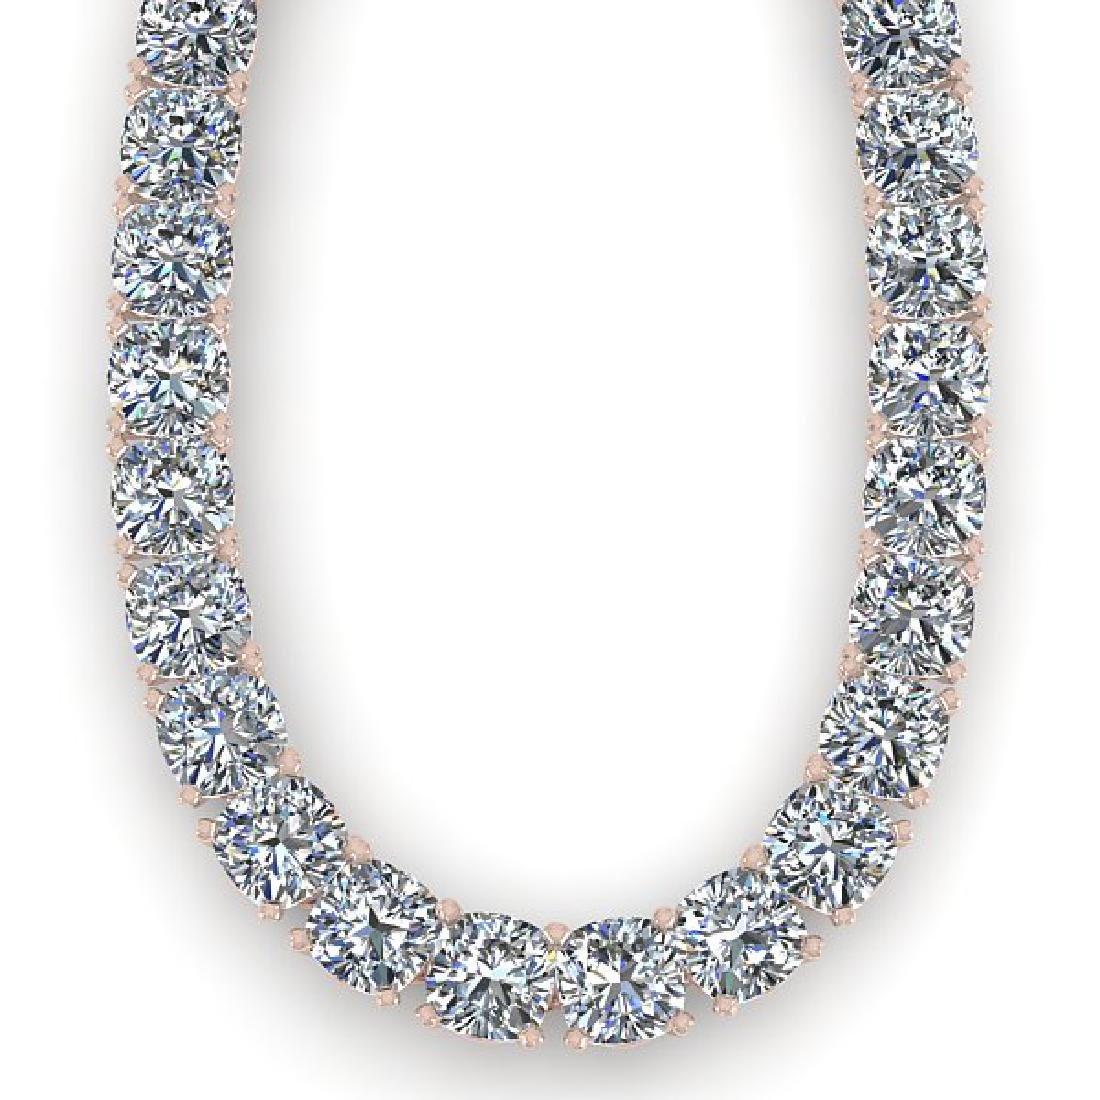 30 CTW Cushion Cut Certified SI Diamond Necklace 18K - 2